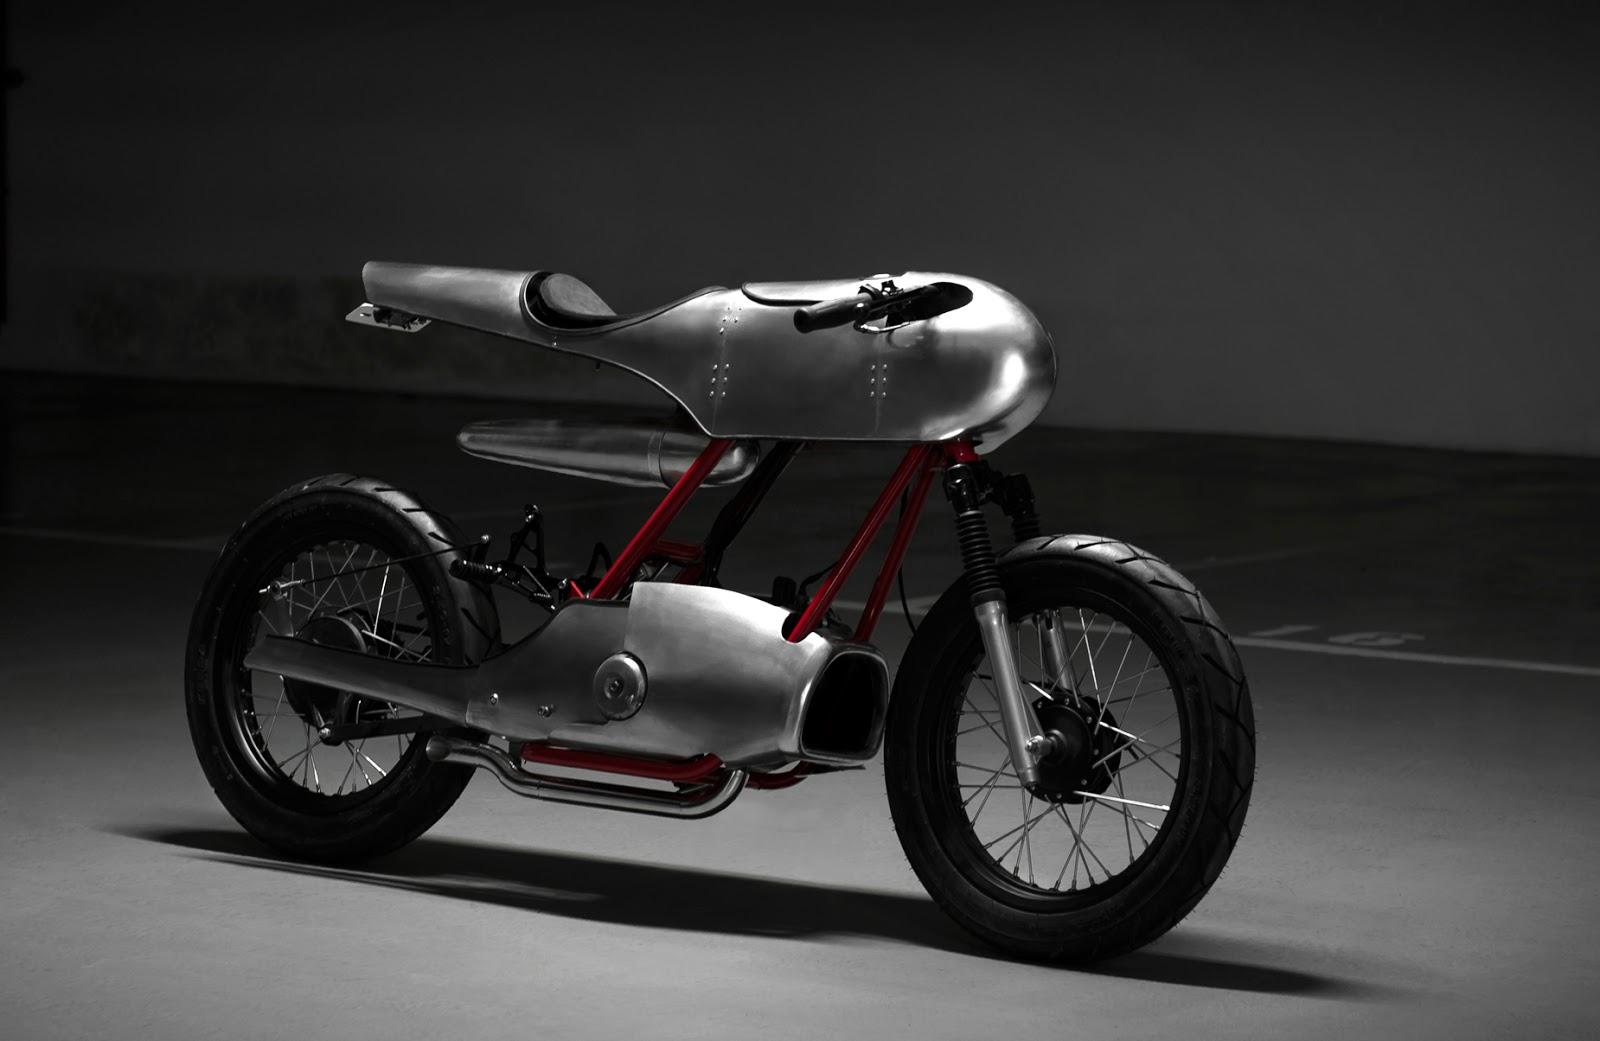 Return of the Cafe Racers - Honda Super Cub Roadrunner concept